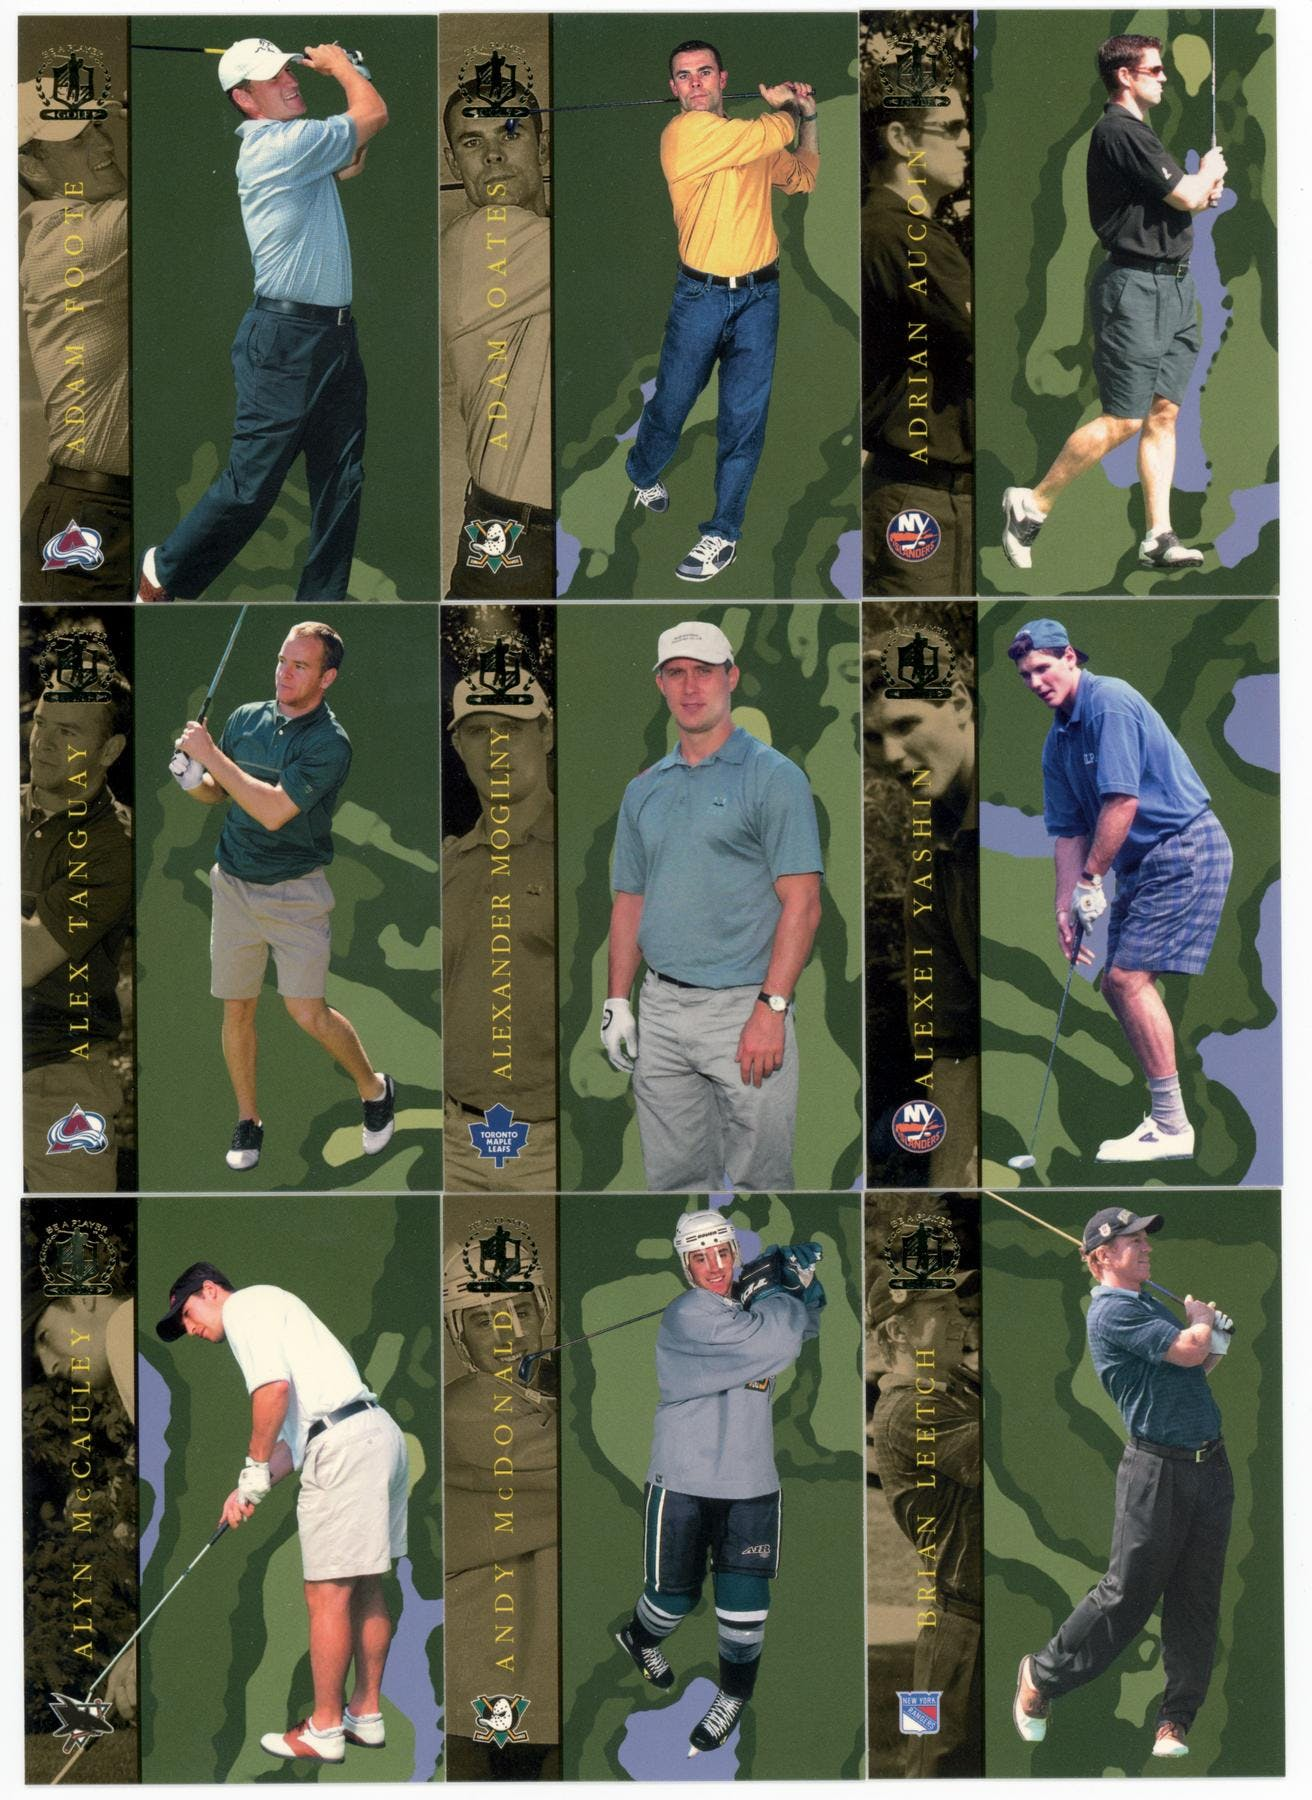 2002 03 itg bap signature series golf complete 100 card set da card world. Black Bedroom Furniture Sets. Home Design Ideas